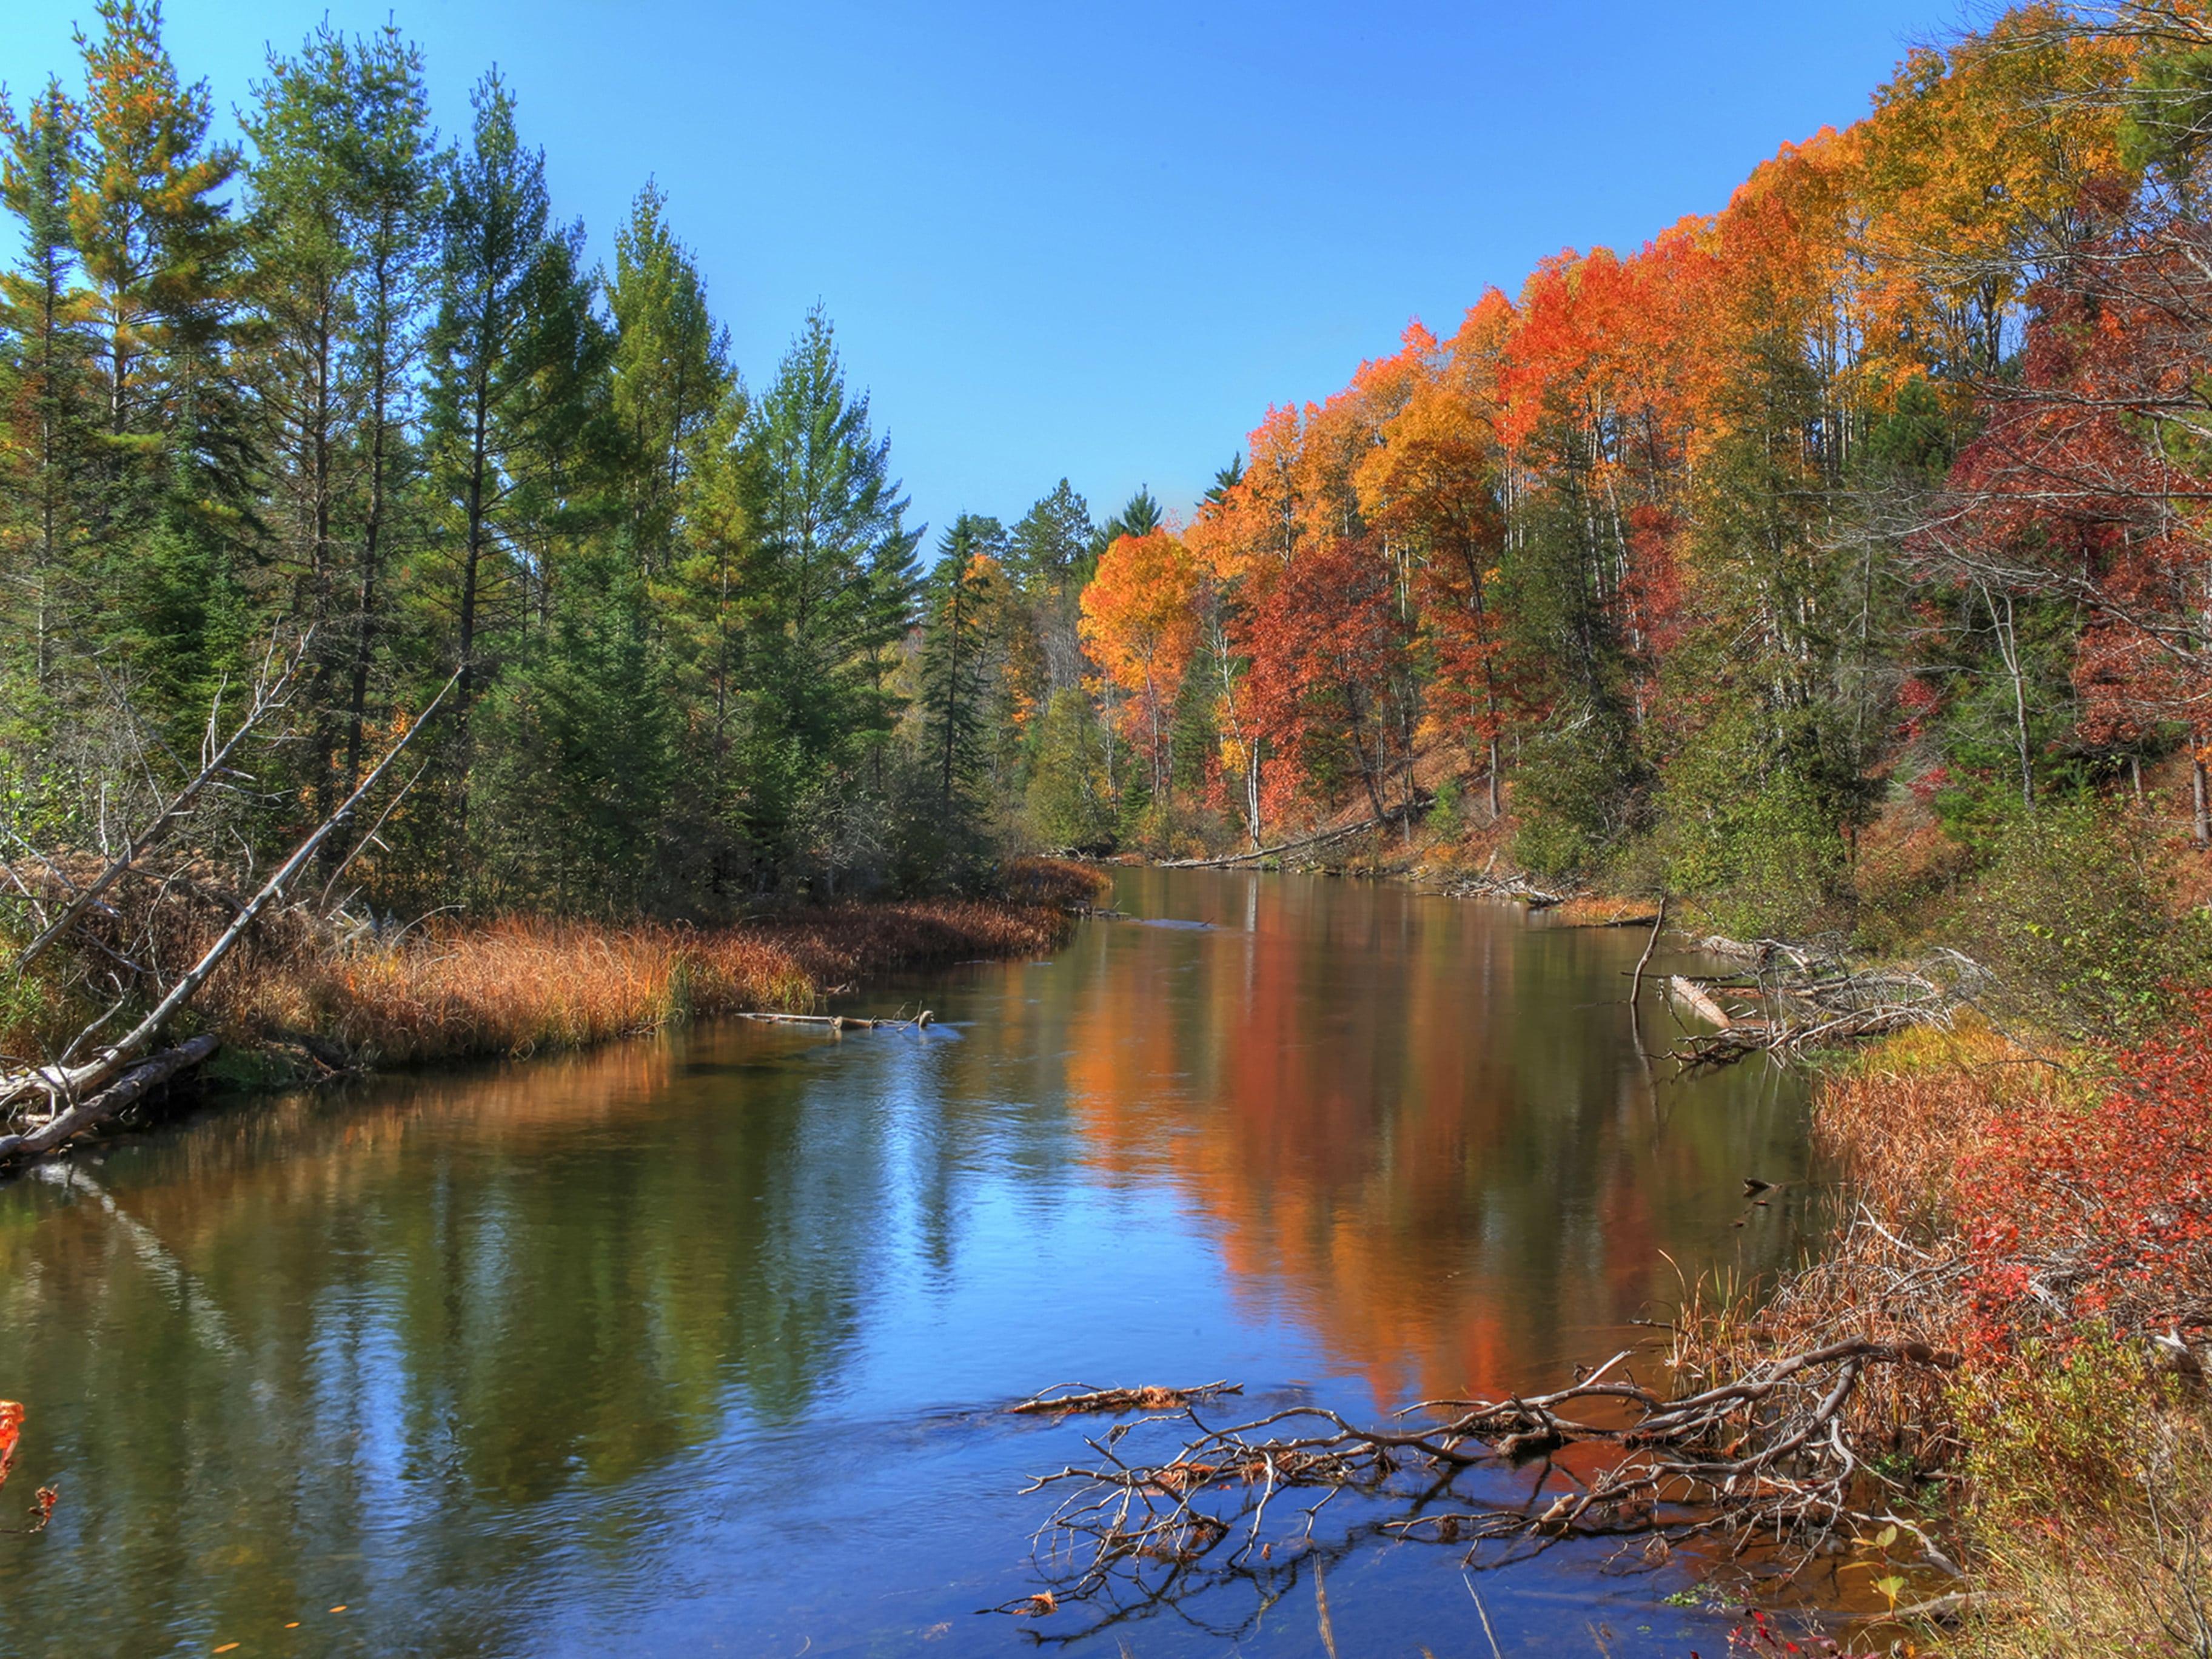 An AuSable Canoe Trip Can be Magical